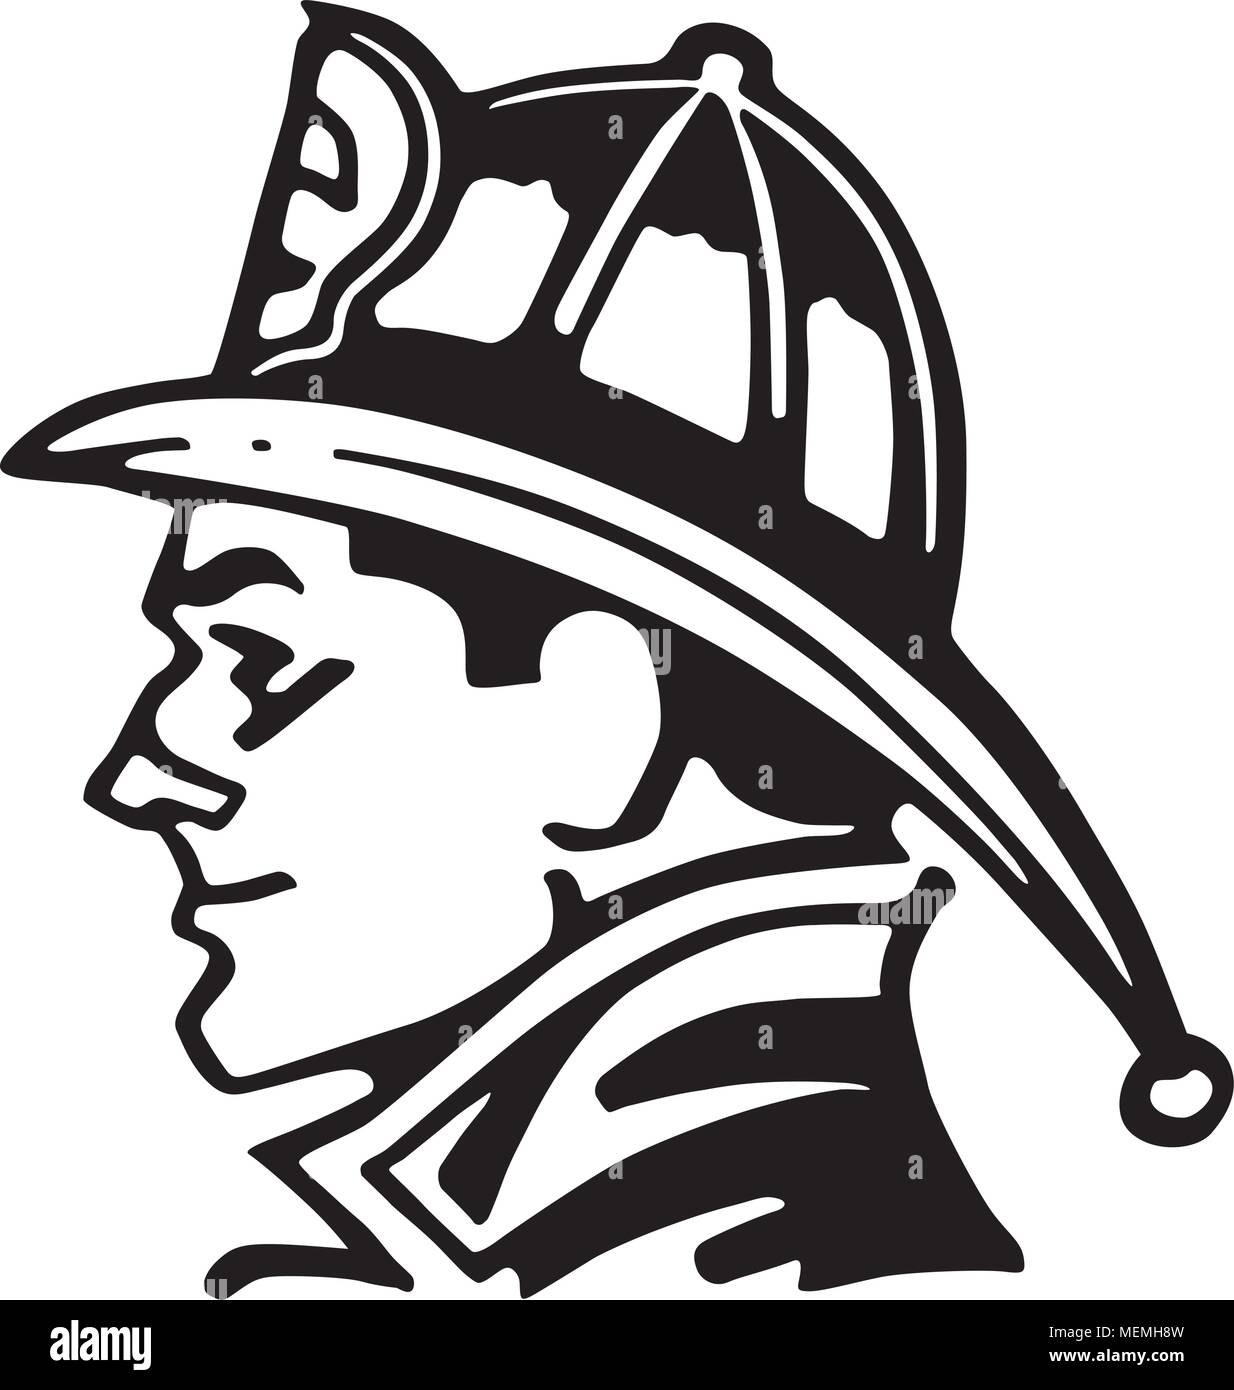 Feuerwehrmann Symbol Retro Clipart Illustration Vektor Abbildung